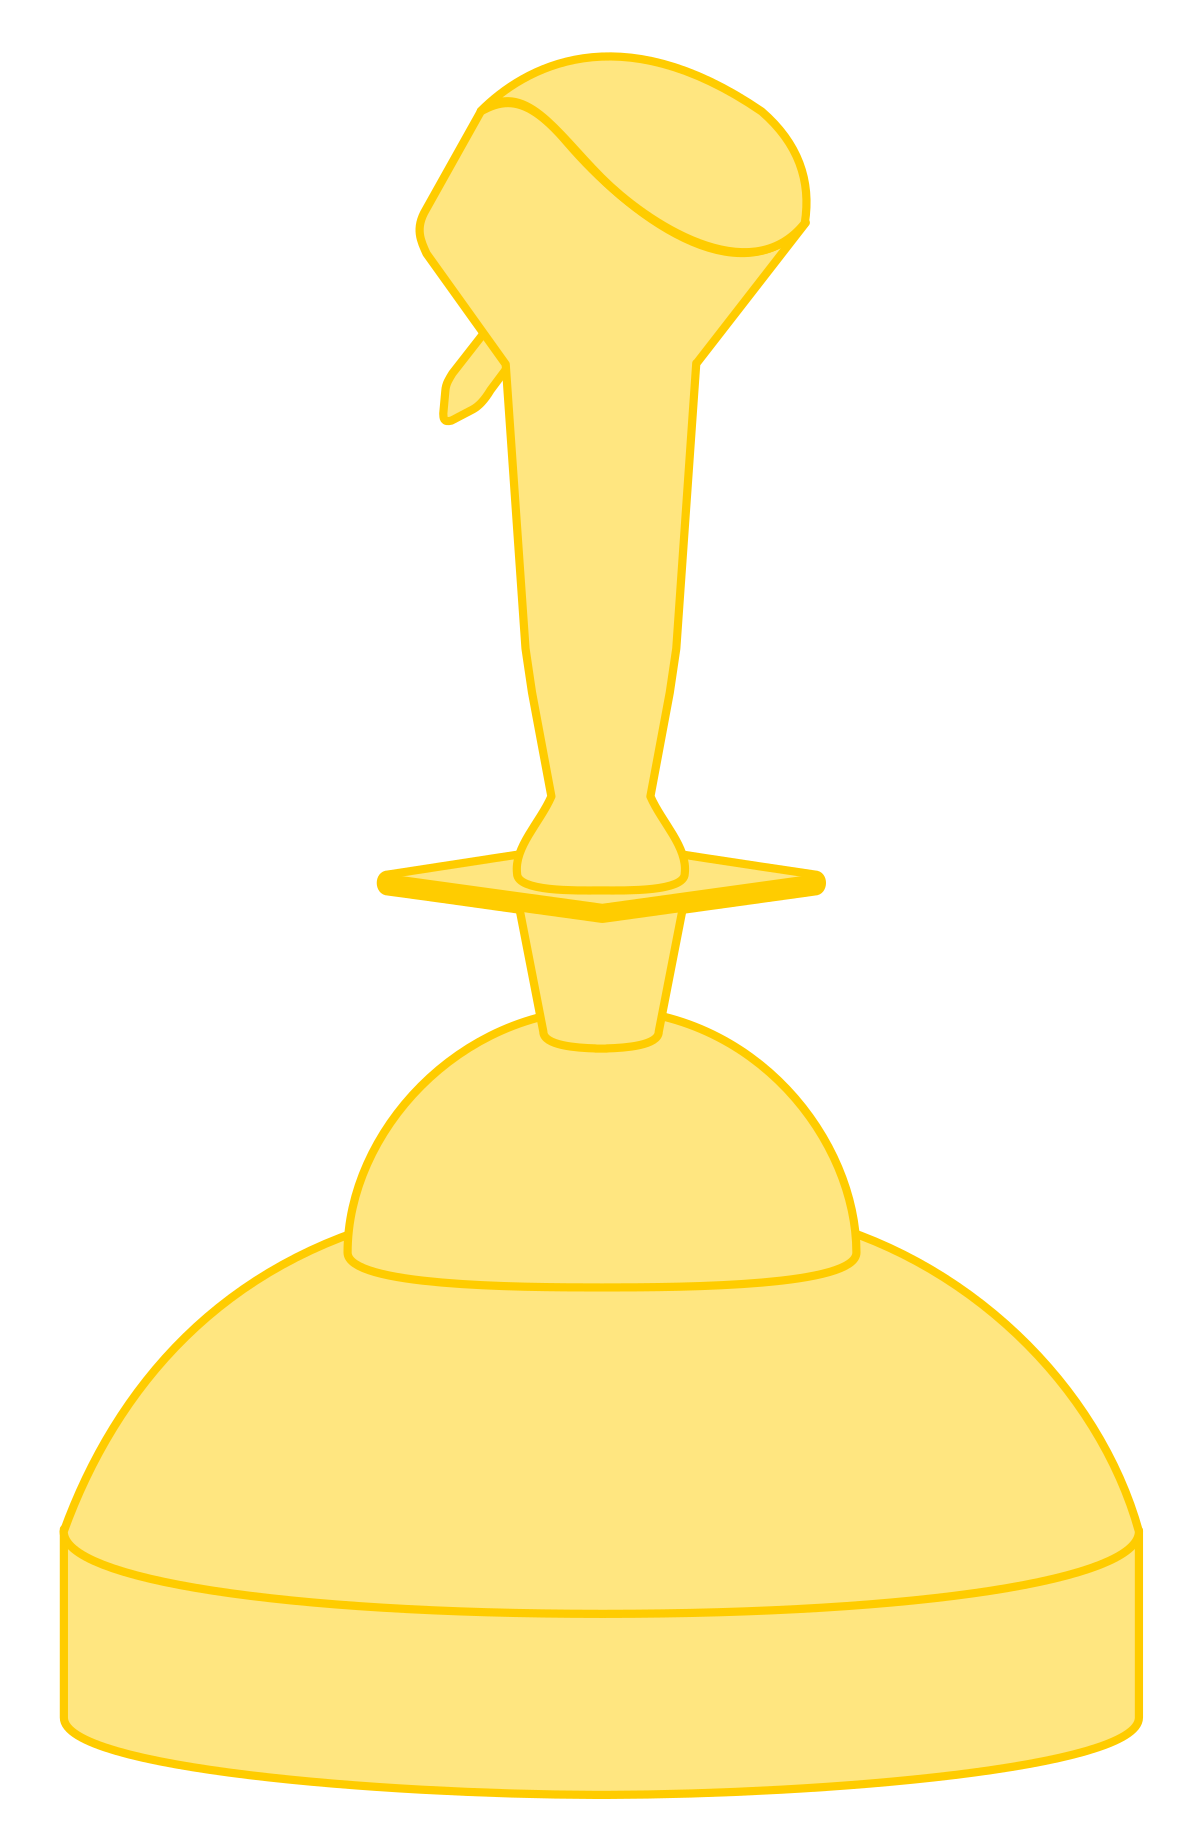 Falcon rising sun clipart royalty free Golden Joystick Awards – Wikipedia royalty free